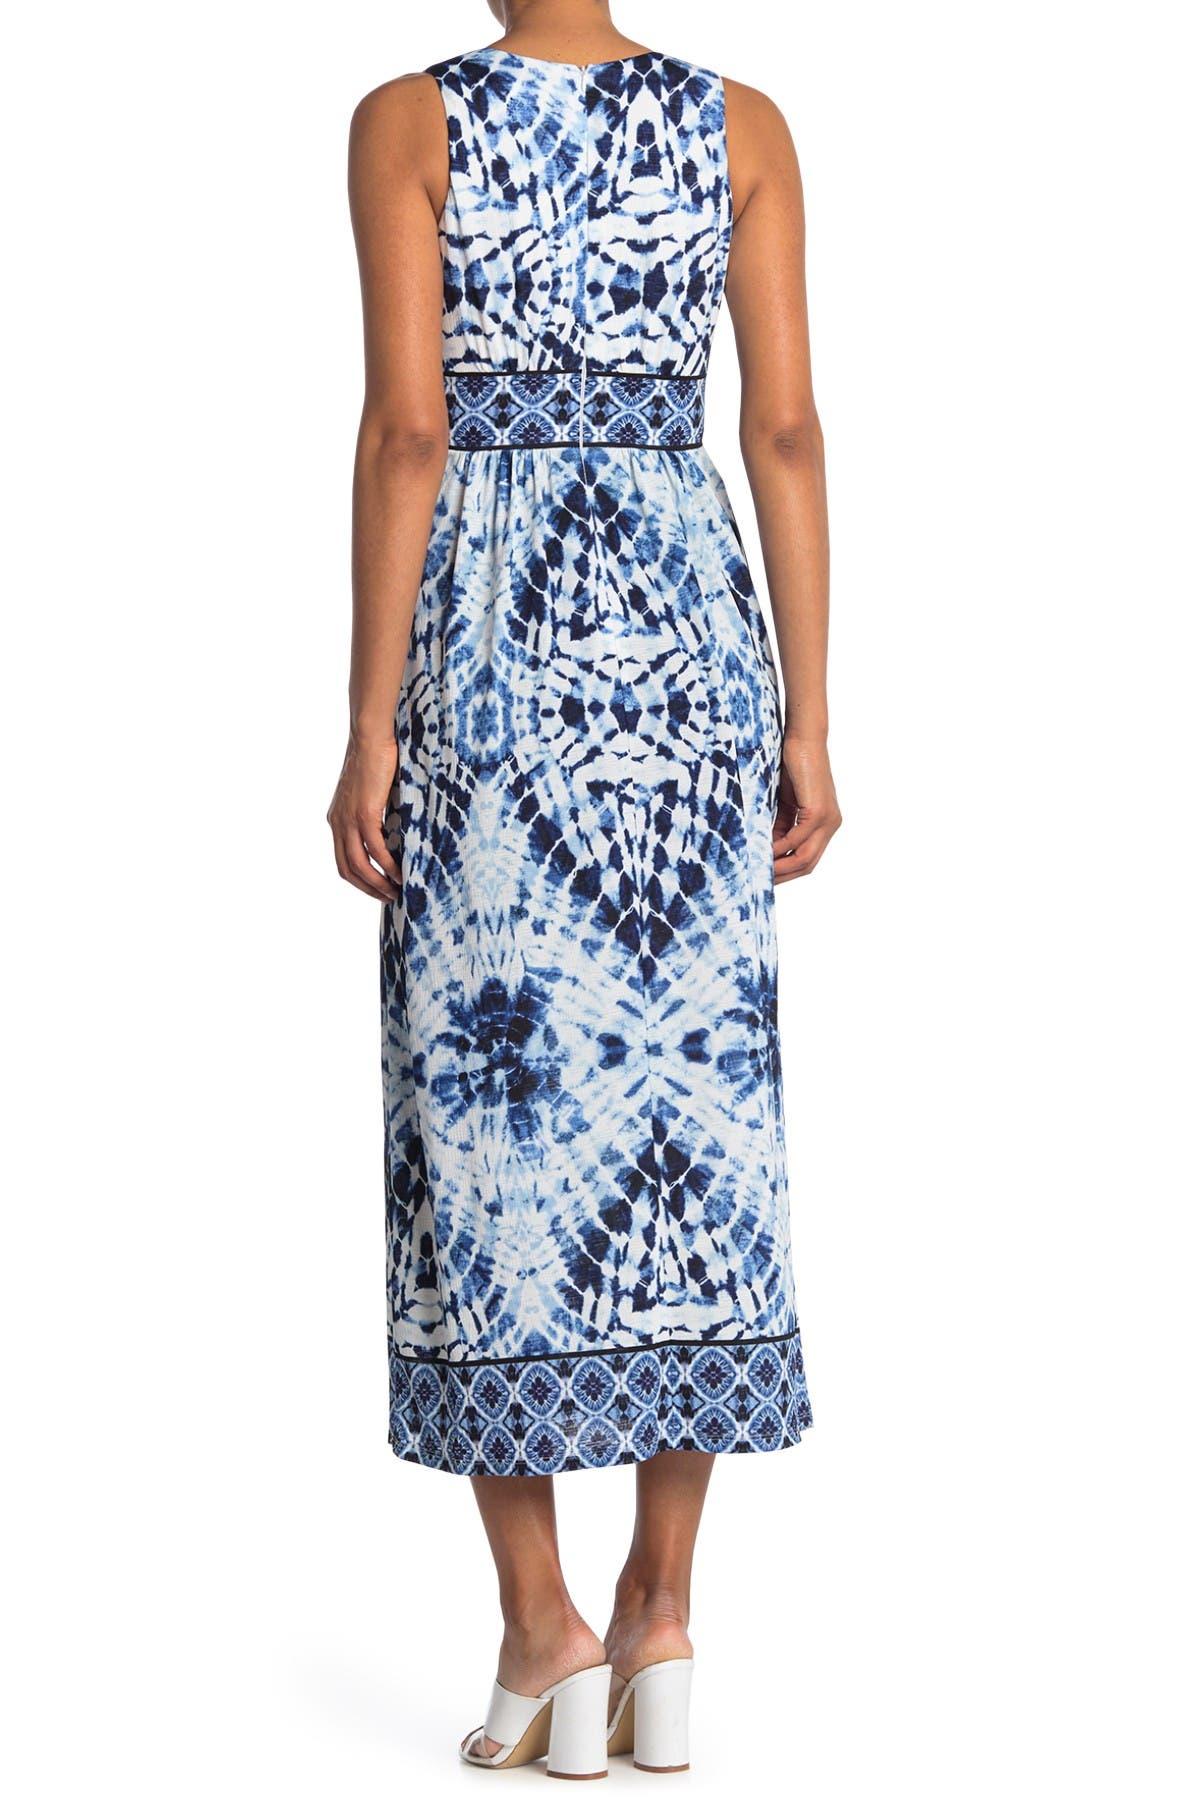 Image of London Times Tie-Dye V-Neck Sleeveless Maxi Dress